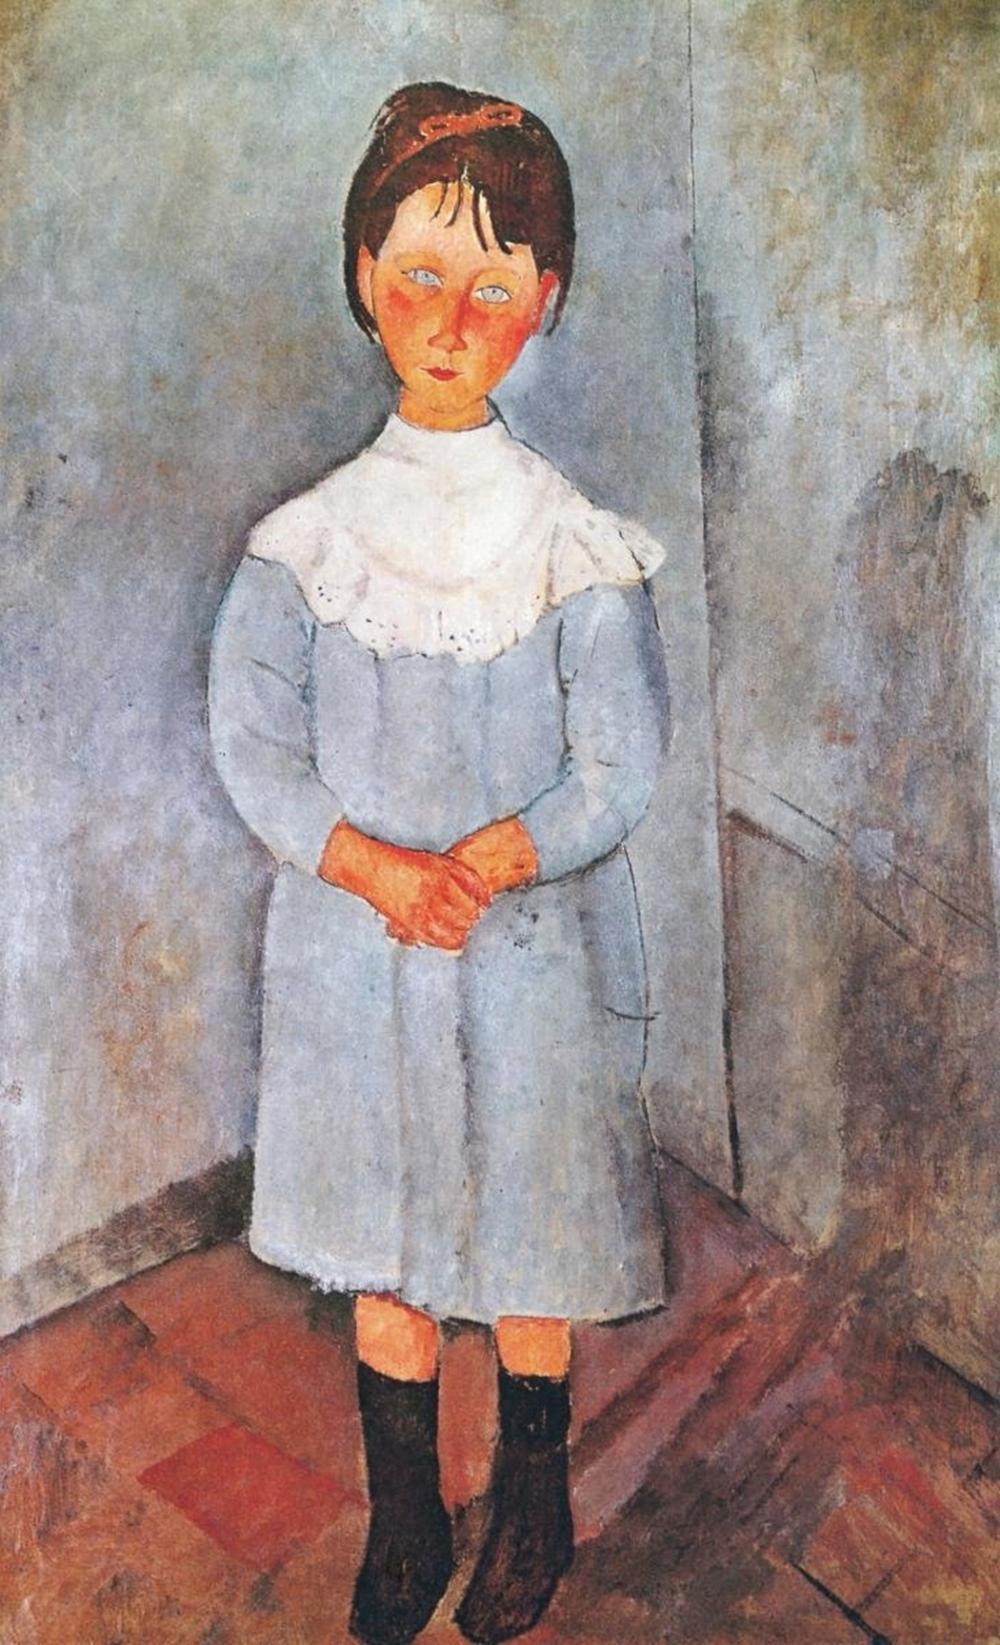 AMEDEO MODIGLIANI - LITTLE GIRL IN BLUE